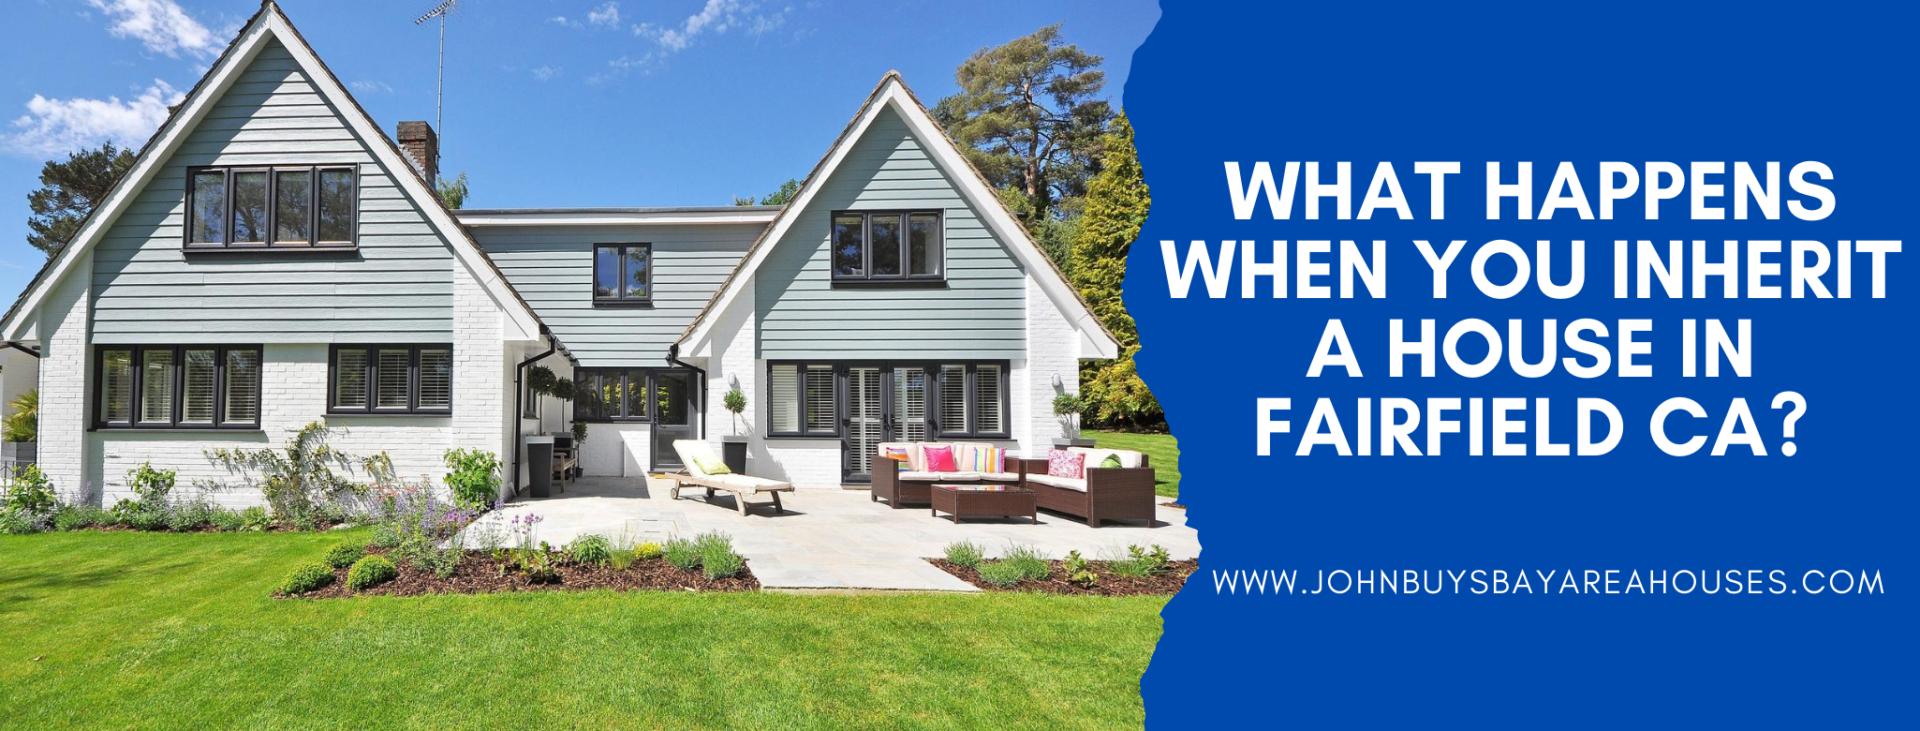 We buy properties in Fairfield CA